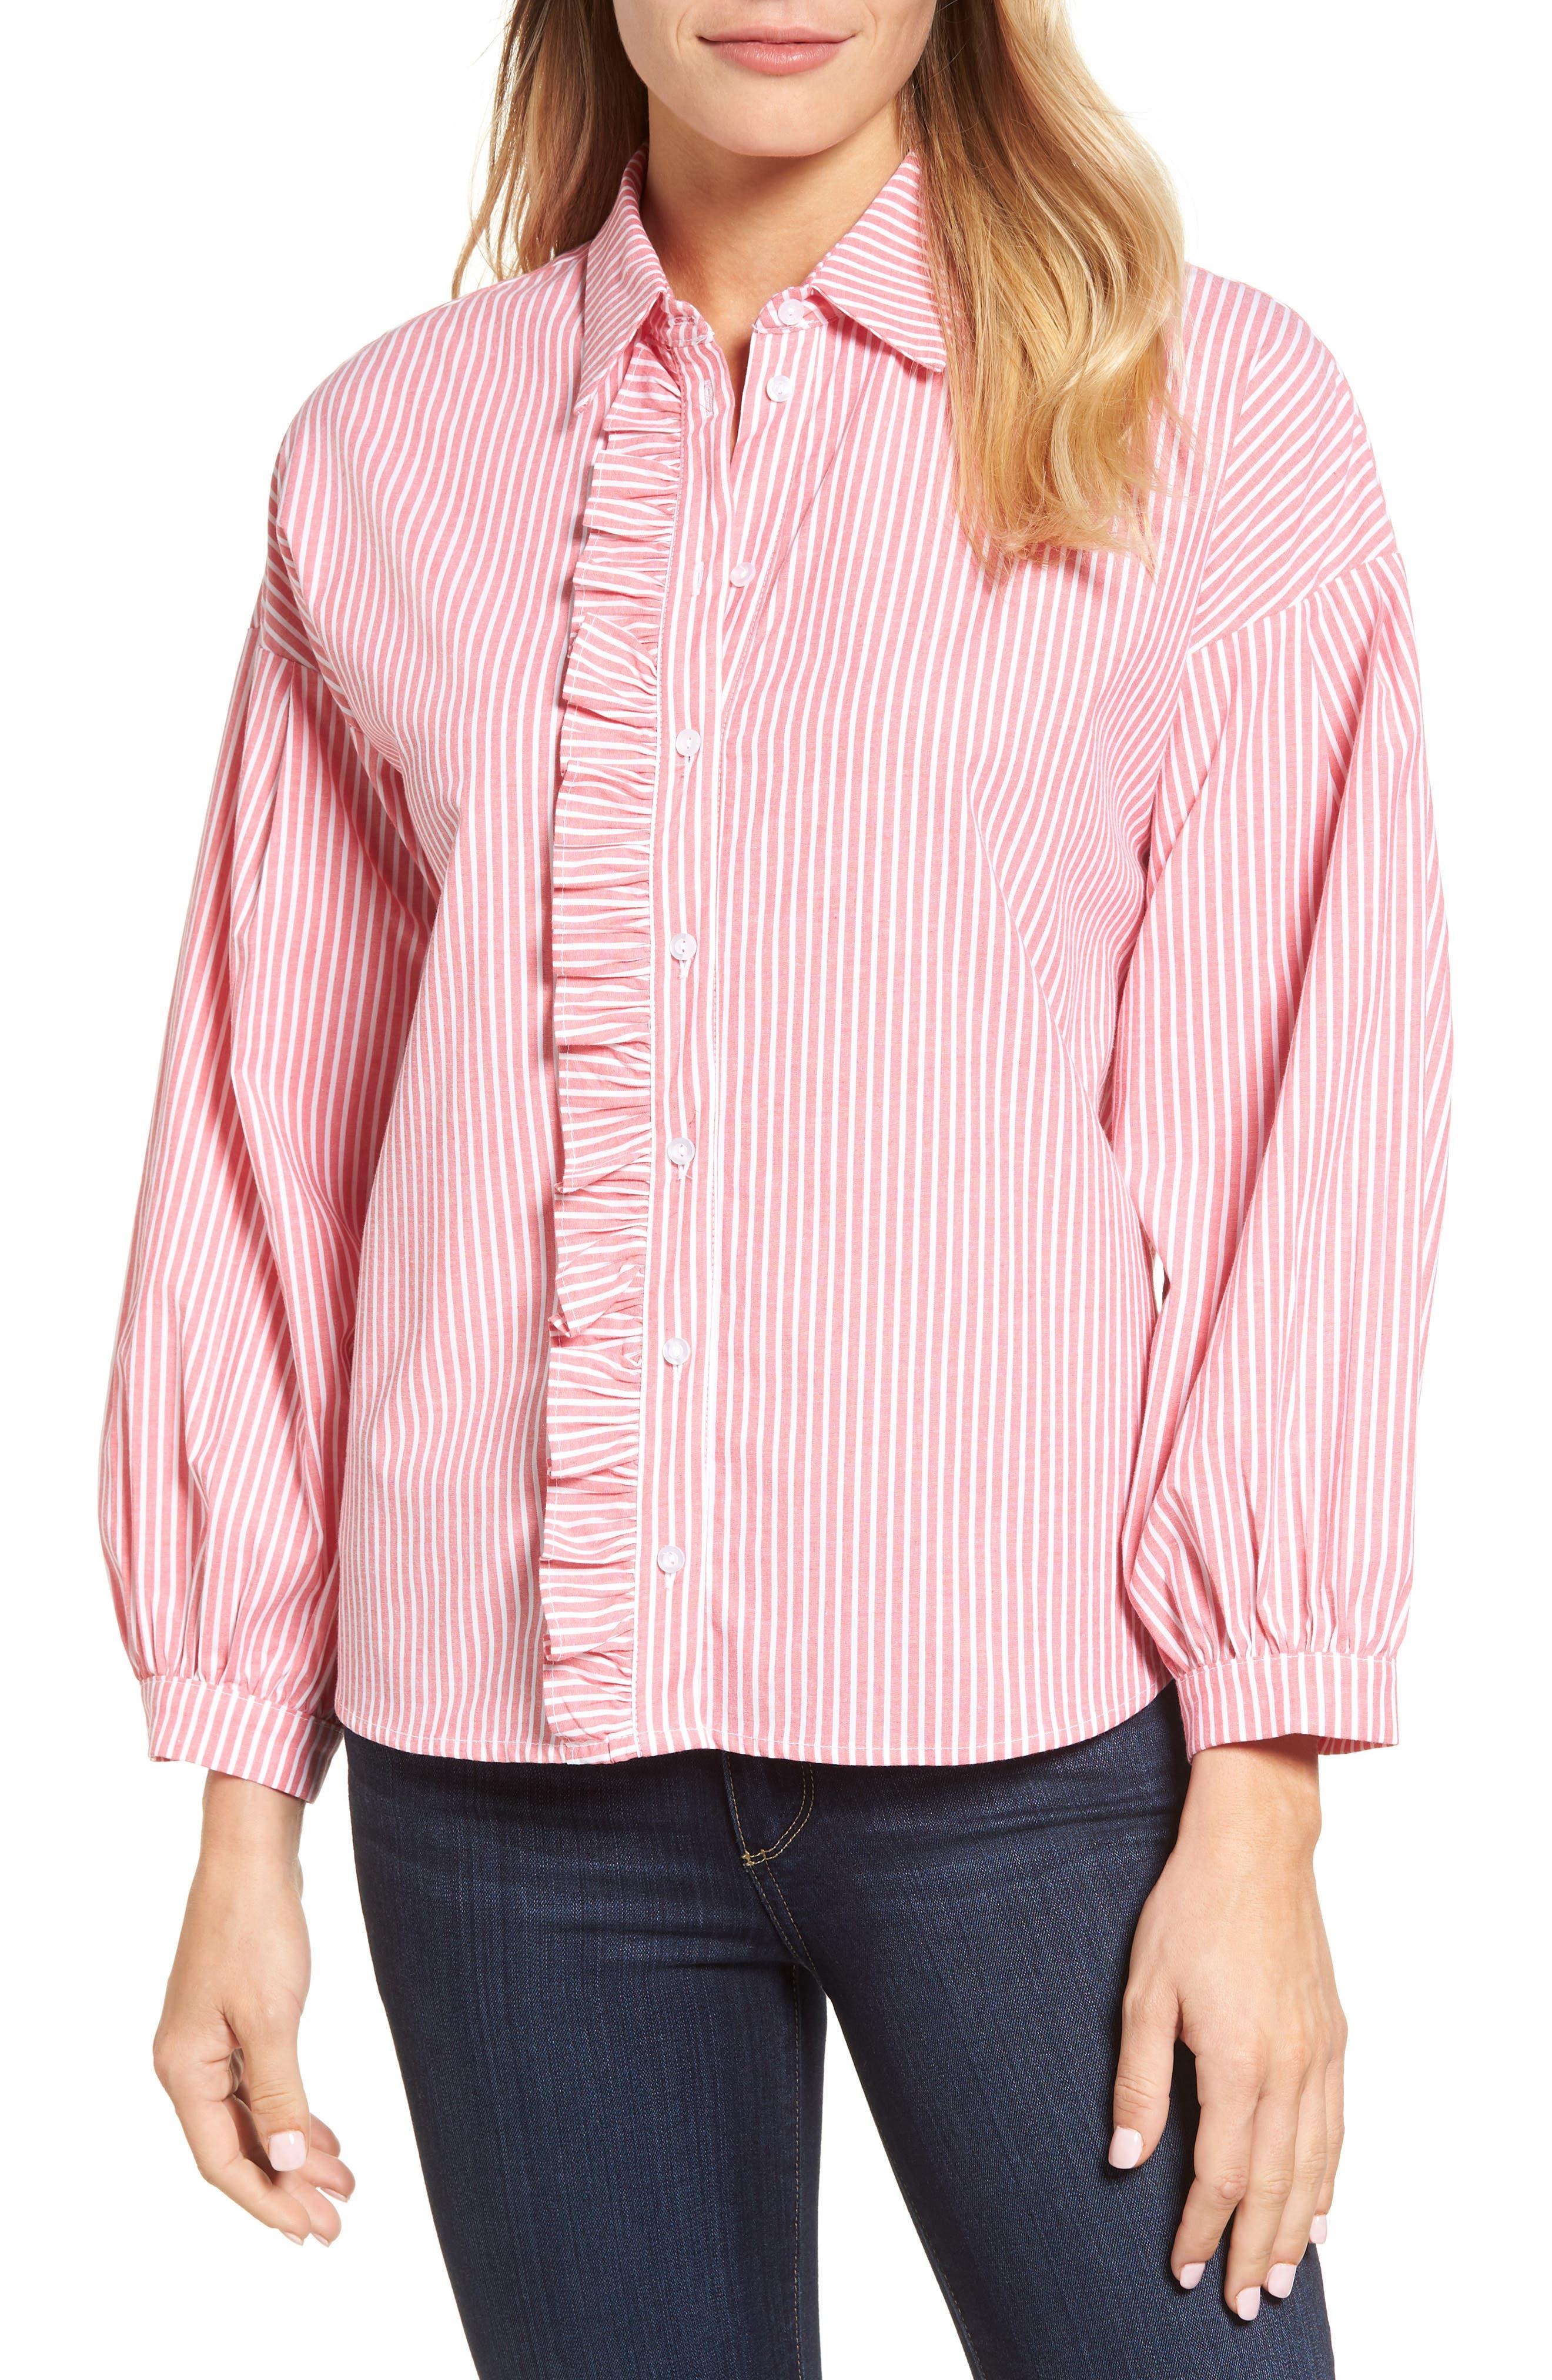 Gibson Blouson Sleeve Shirt